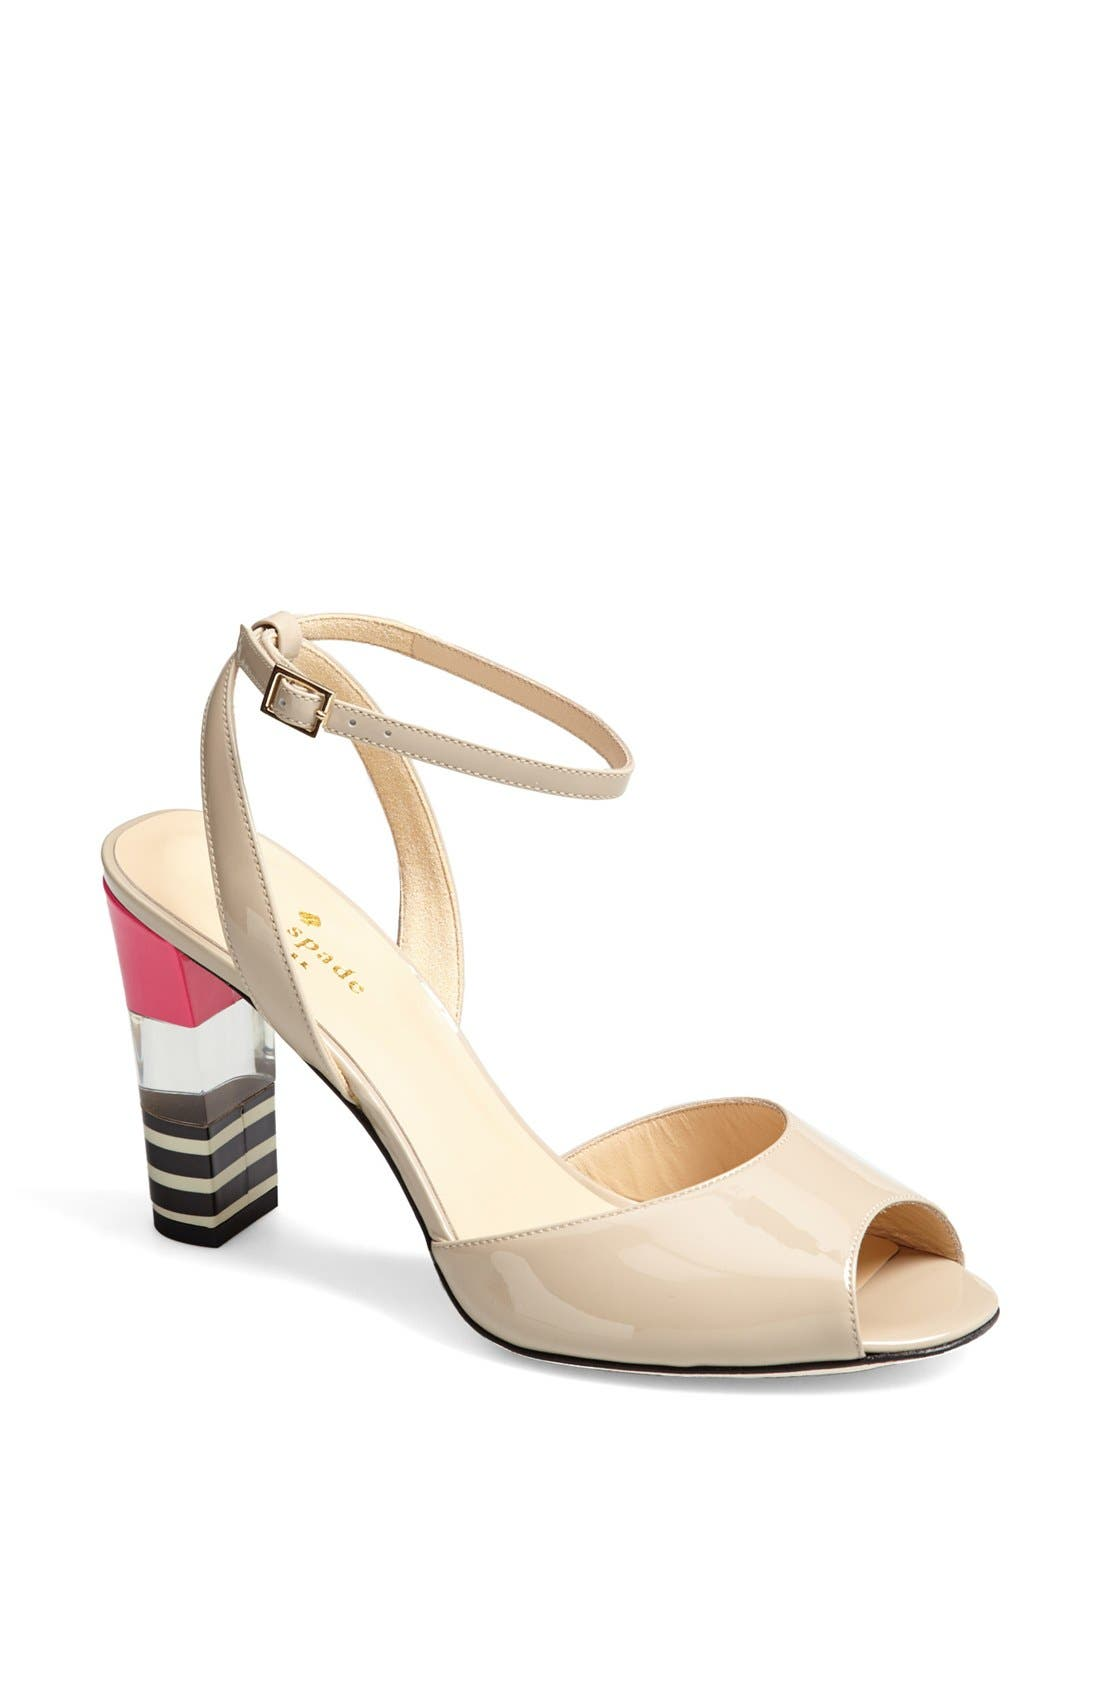 Alternate Image 1 Selected - kate spade new york 'ice' leather sandal